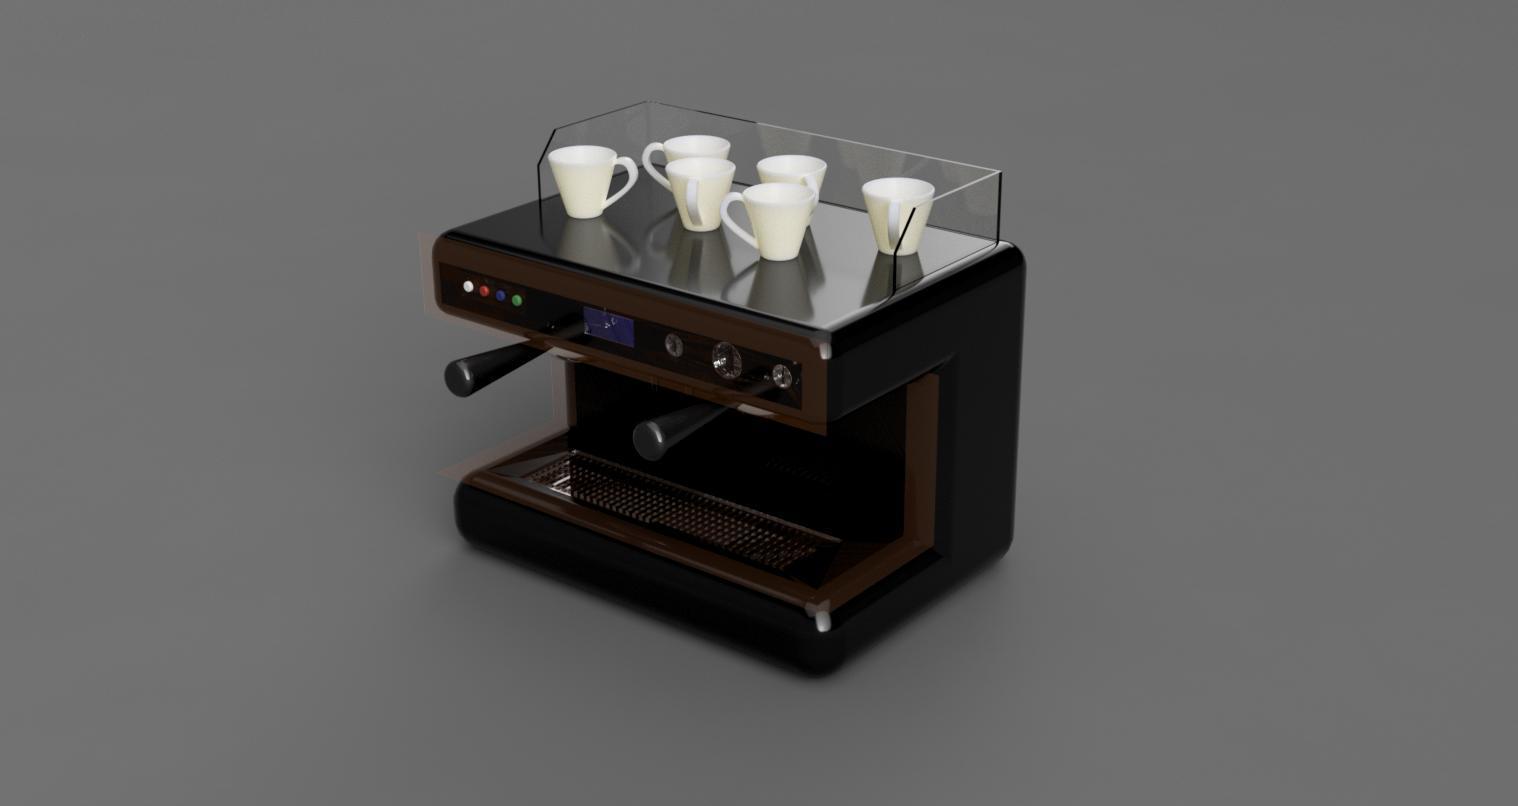 Ekspres v24.jpg Download STL file Coffee machine • 3D printer model, eMBe85